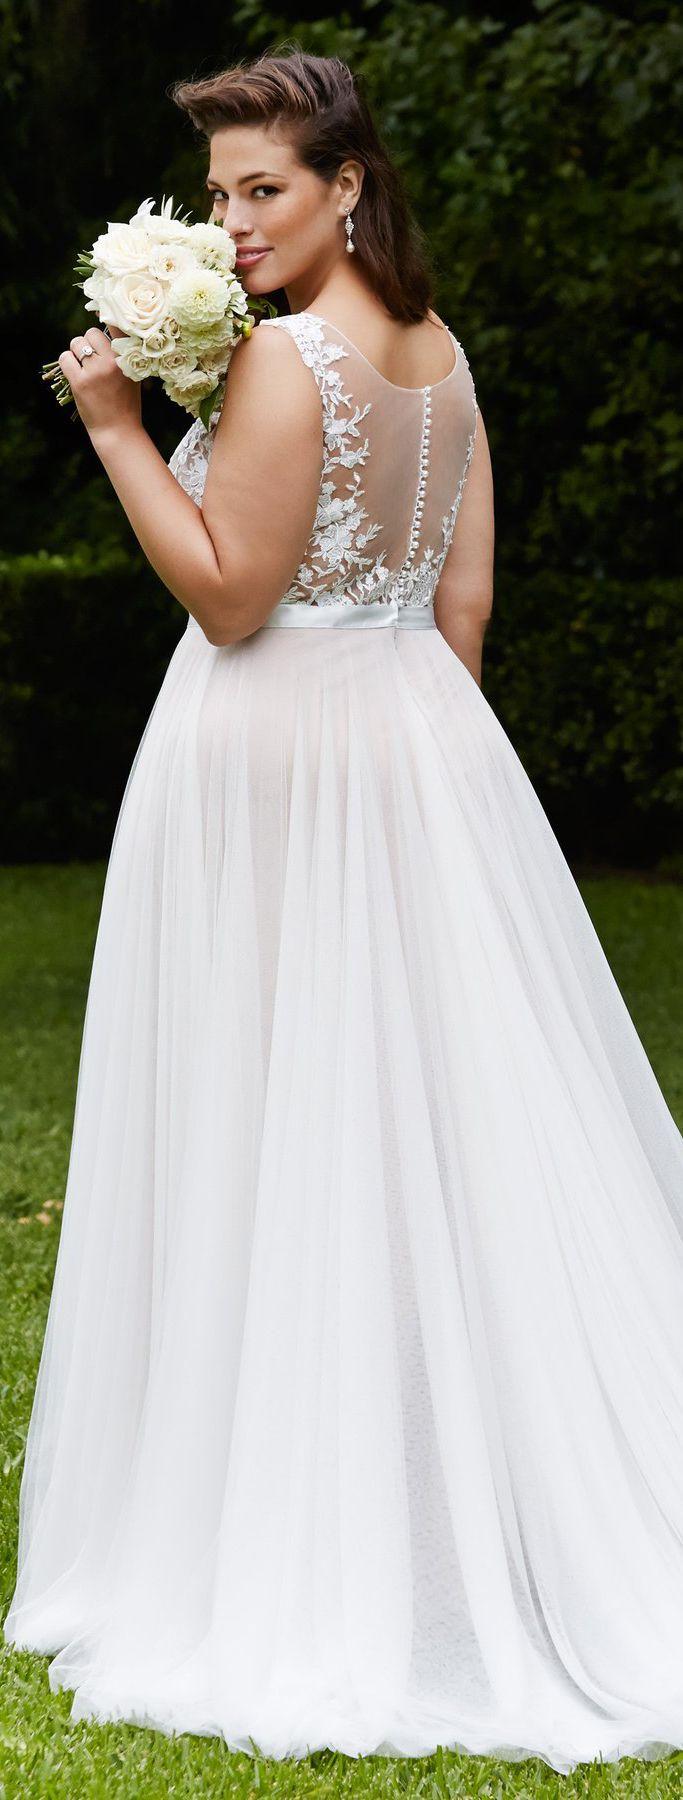 plus size wedding gowns gorgeous wedding dresses 20 Gorgeous Wedding Gowns For Curvy Girls